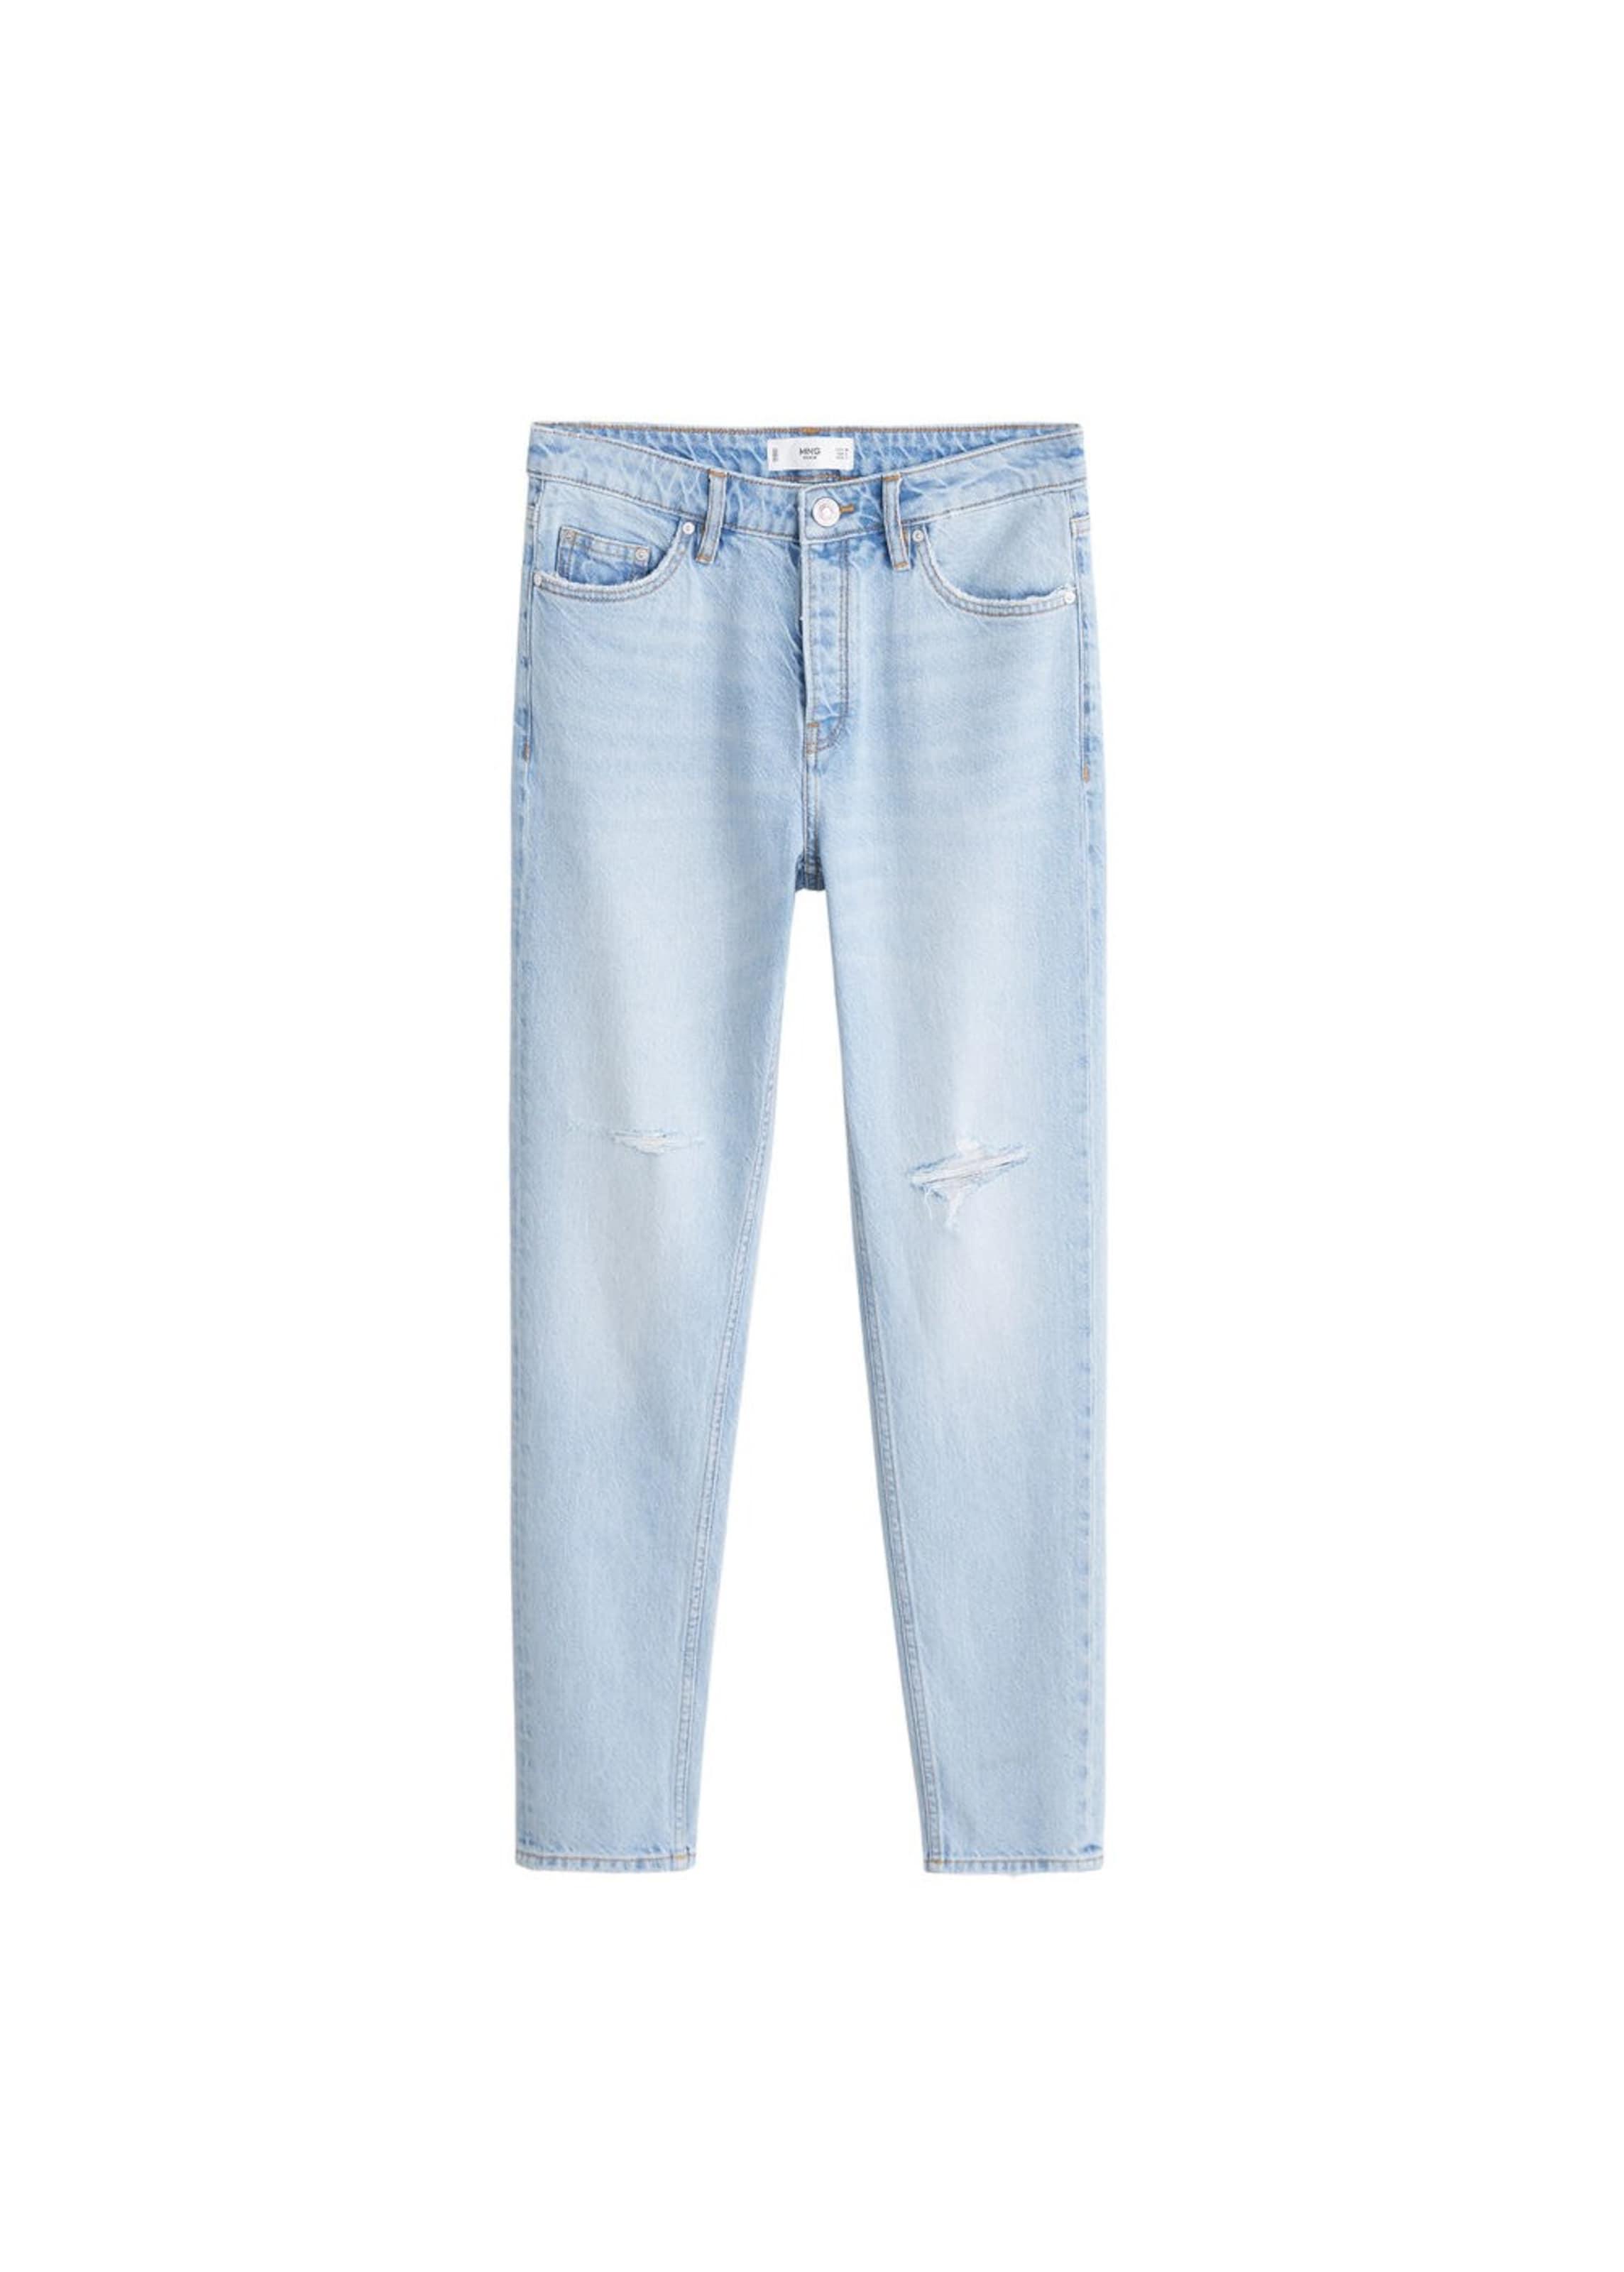 'relax' Hellblau 'relax' Mango 'relax' Jeans Mango Jeans In In Hellblau Mango Jeans If76gbyvmY